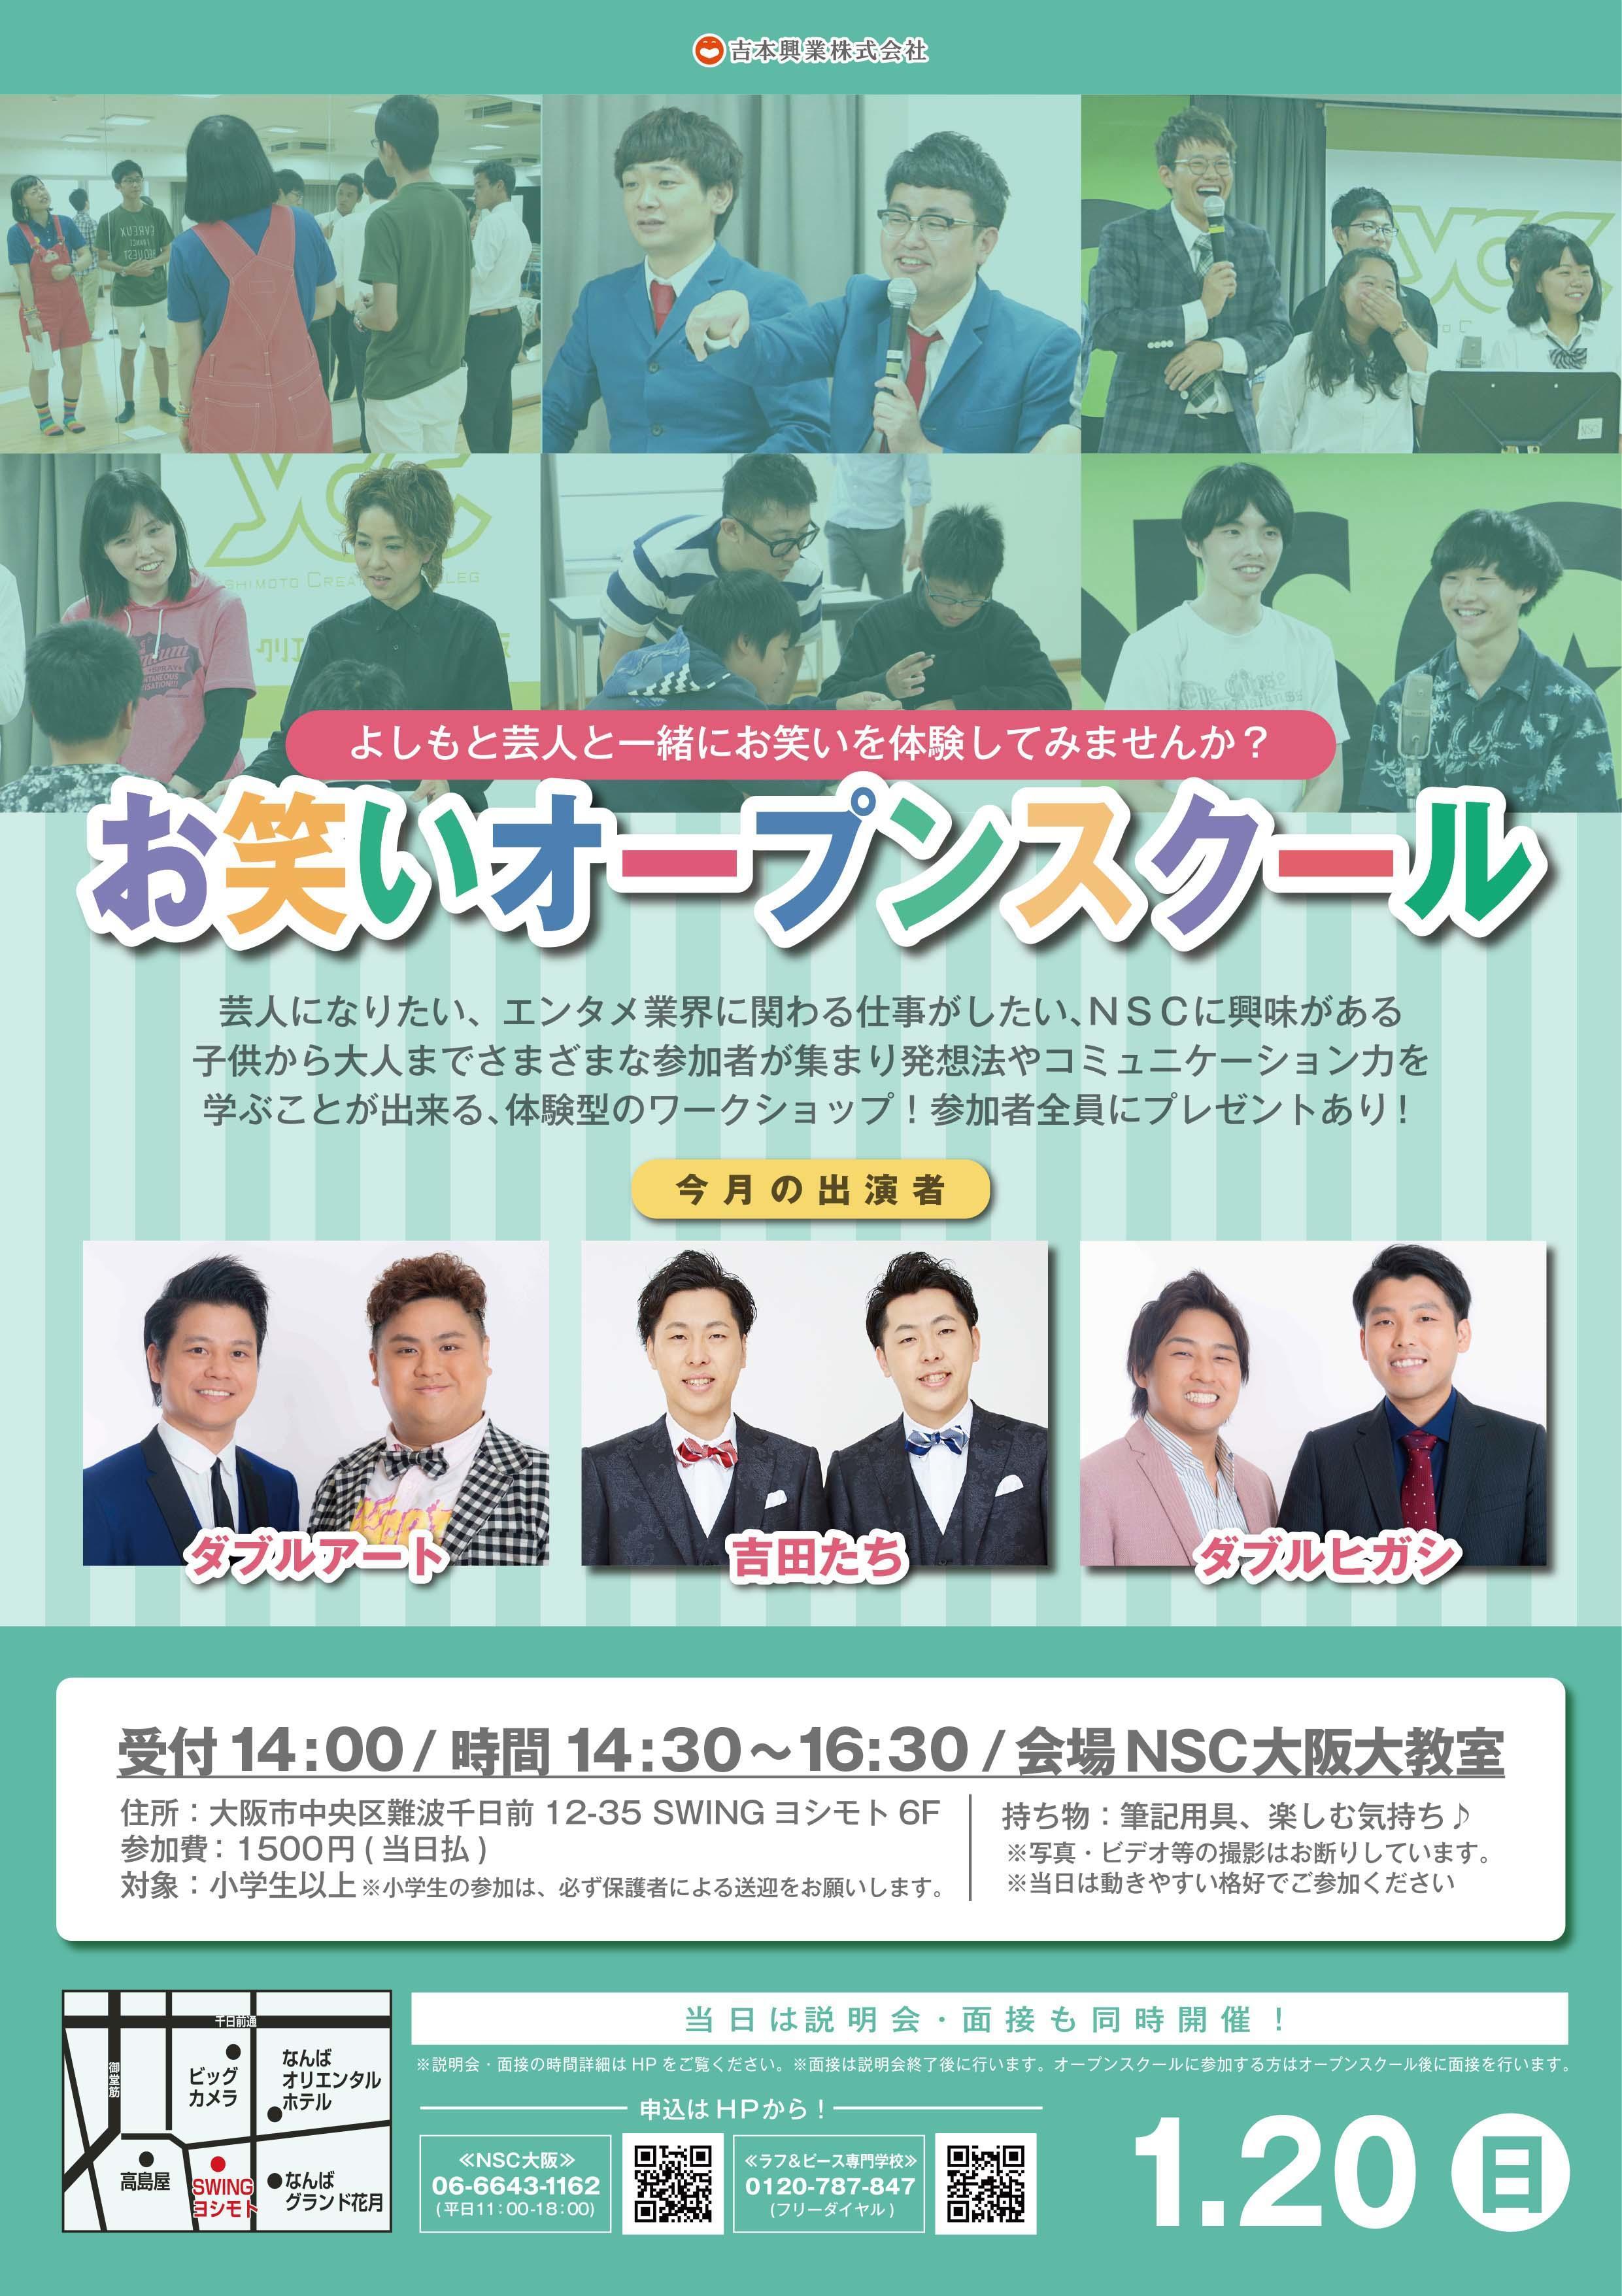 http://news.yoshimoto.co.jp/20181223000956-9a5e31fa387eb06dfb117066bee3996a89e0fc0e.jpg